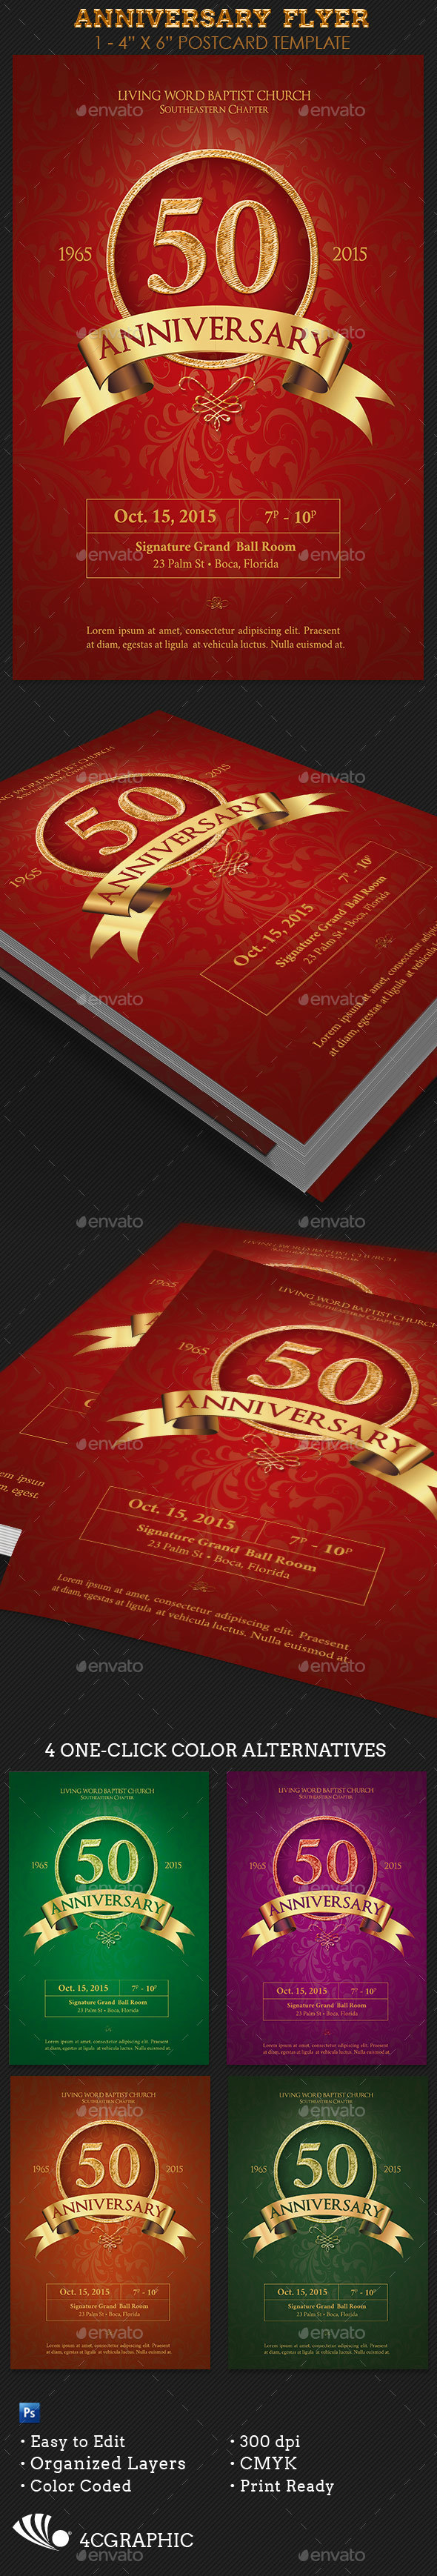 Church Anniversary Flyer Template - Invitations Cards & Invites